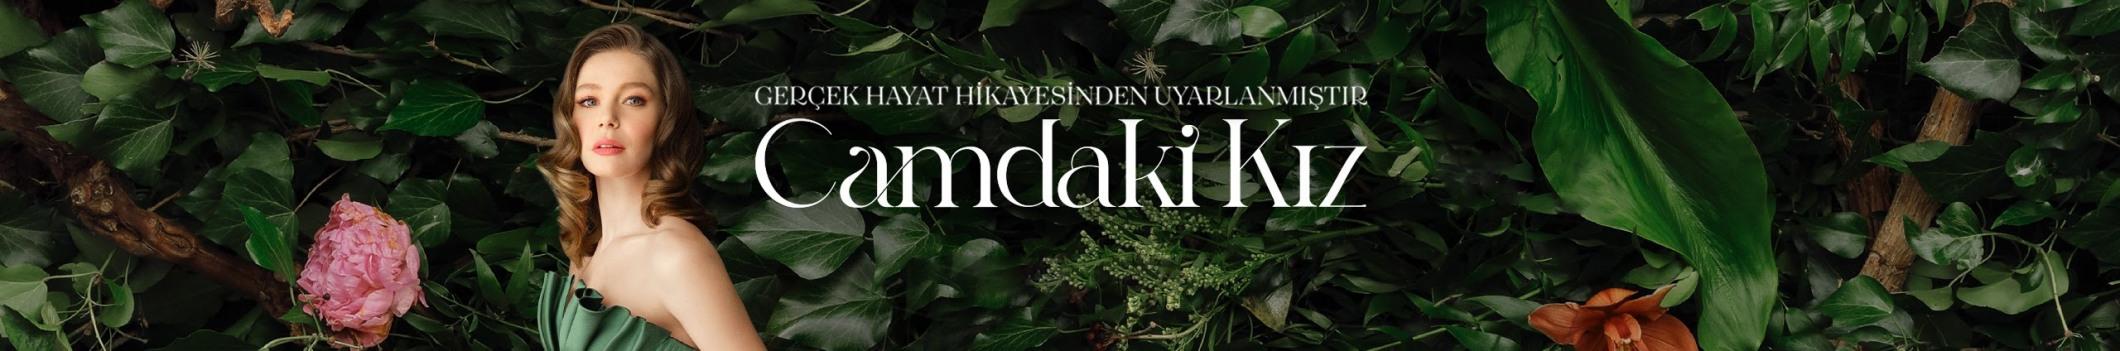 Camdaki Kiz English subtitles - The Girl In The Glass